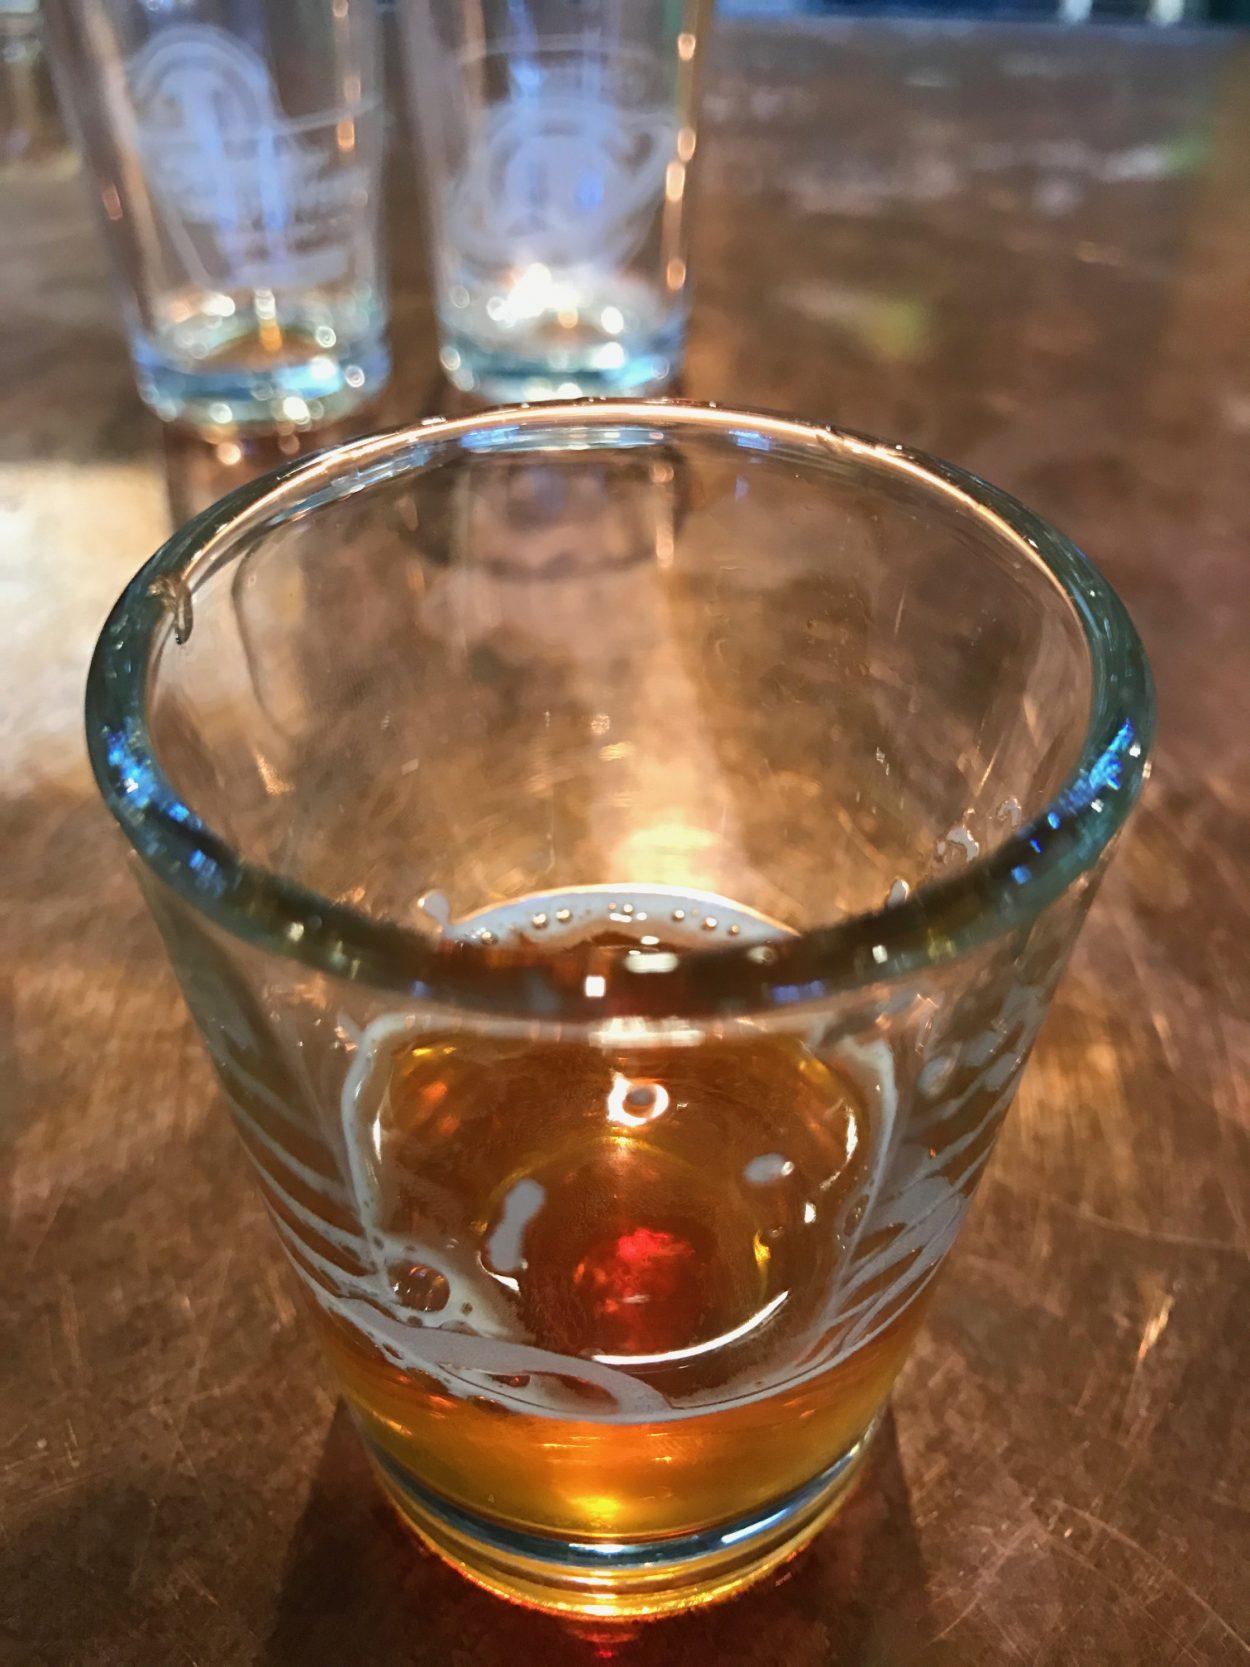 shandy or radler garden to glass summer shandies beer tasting